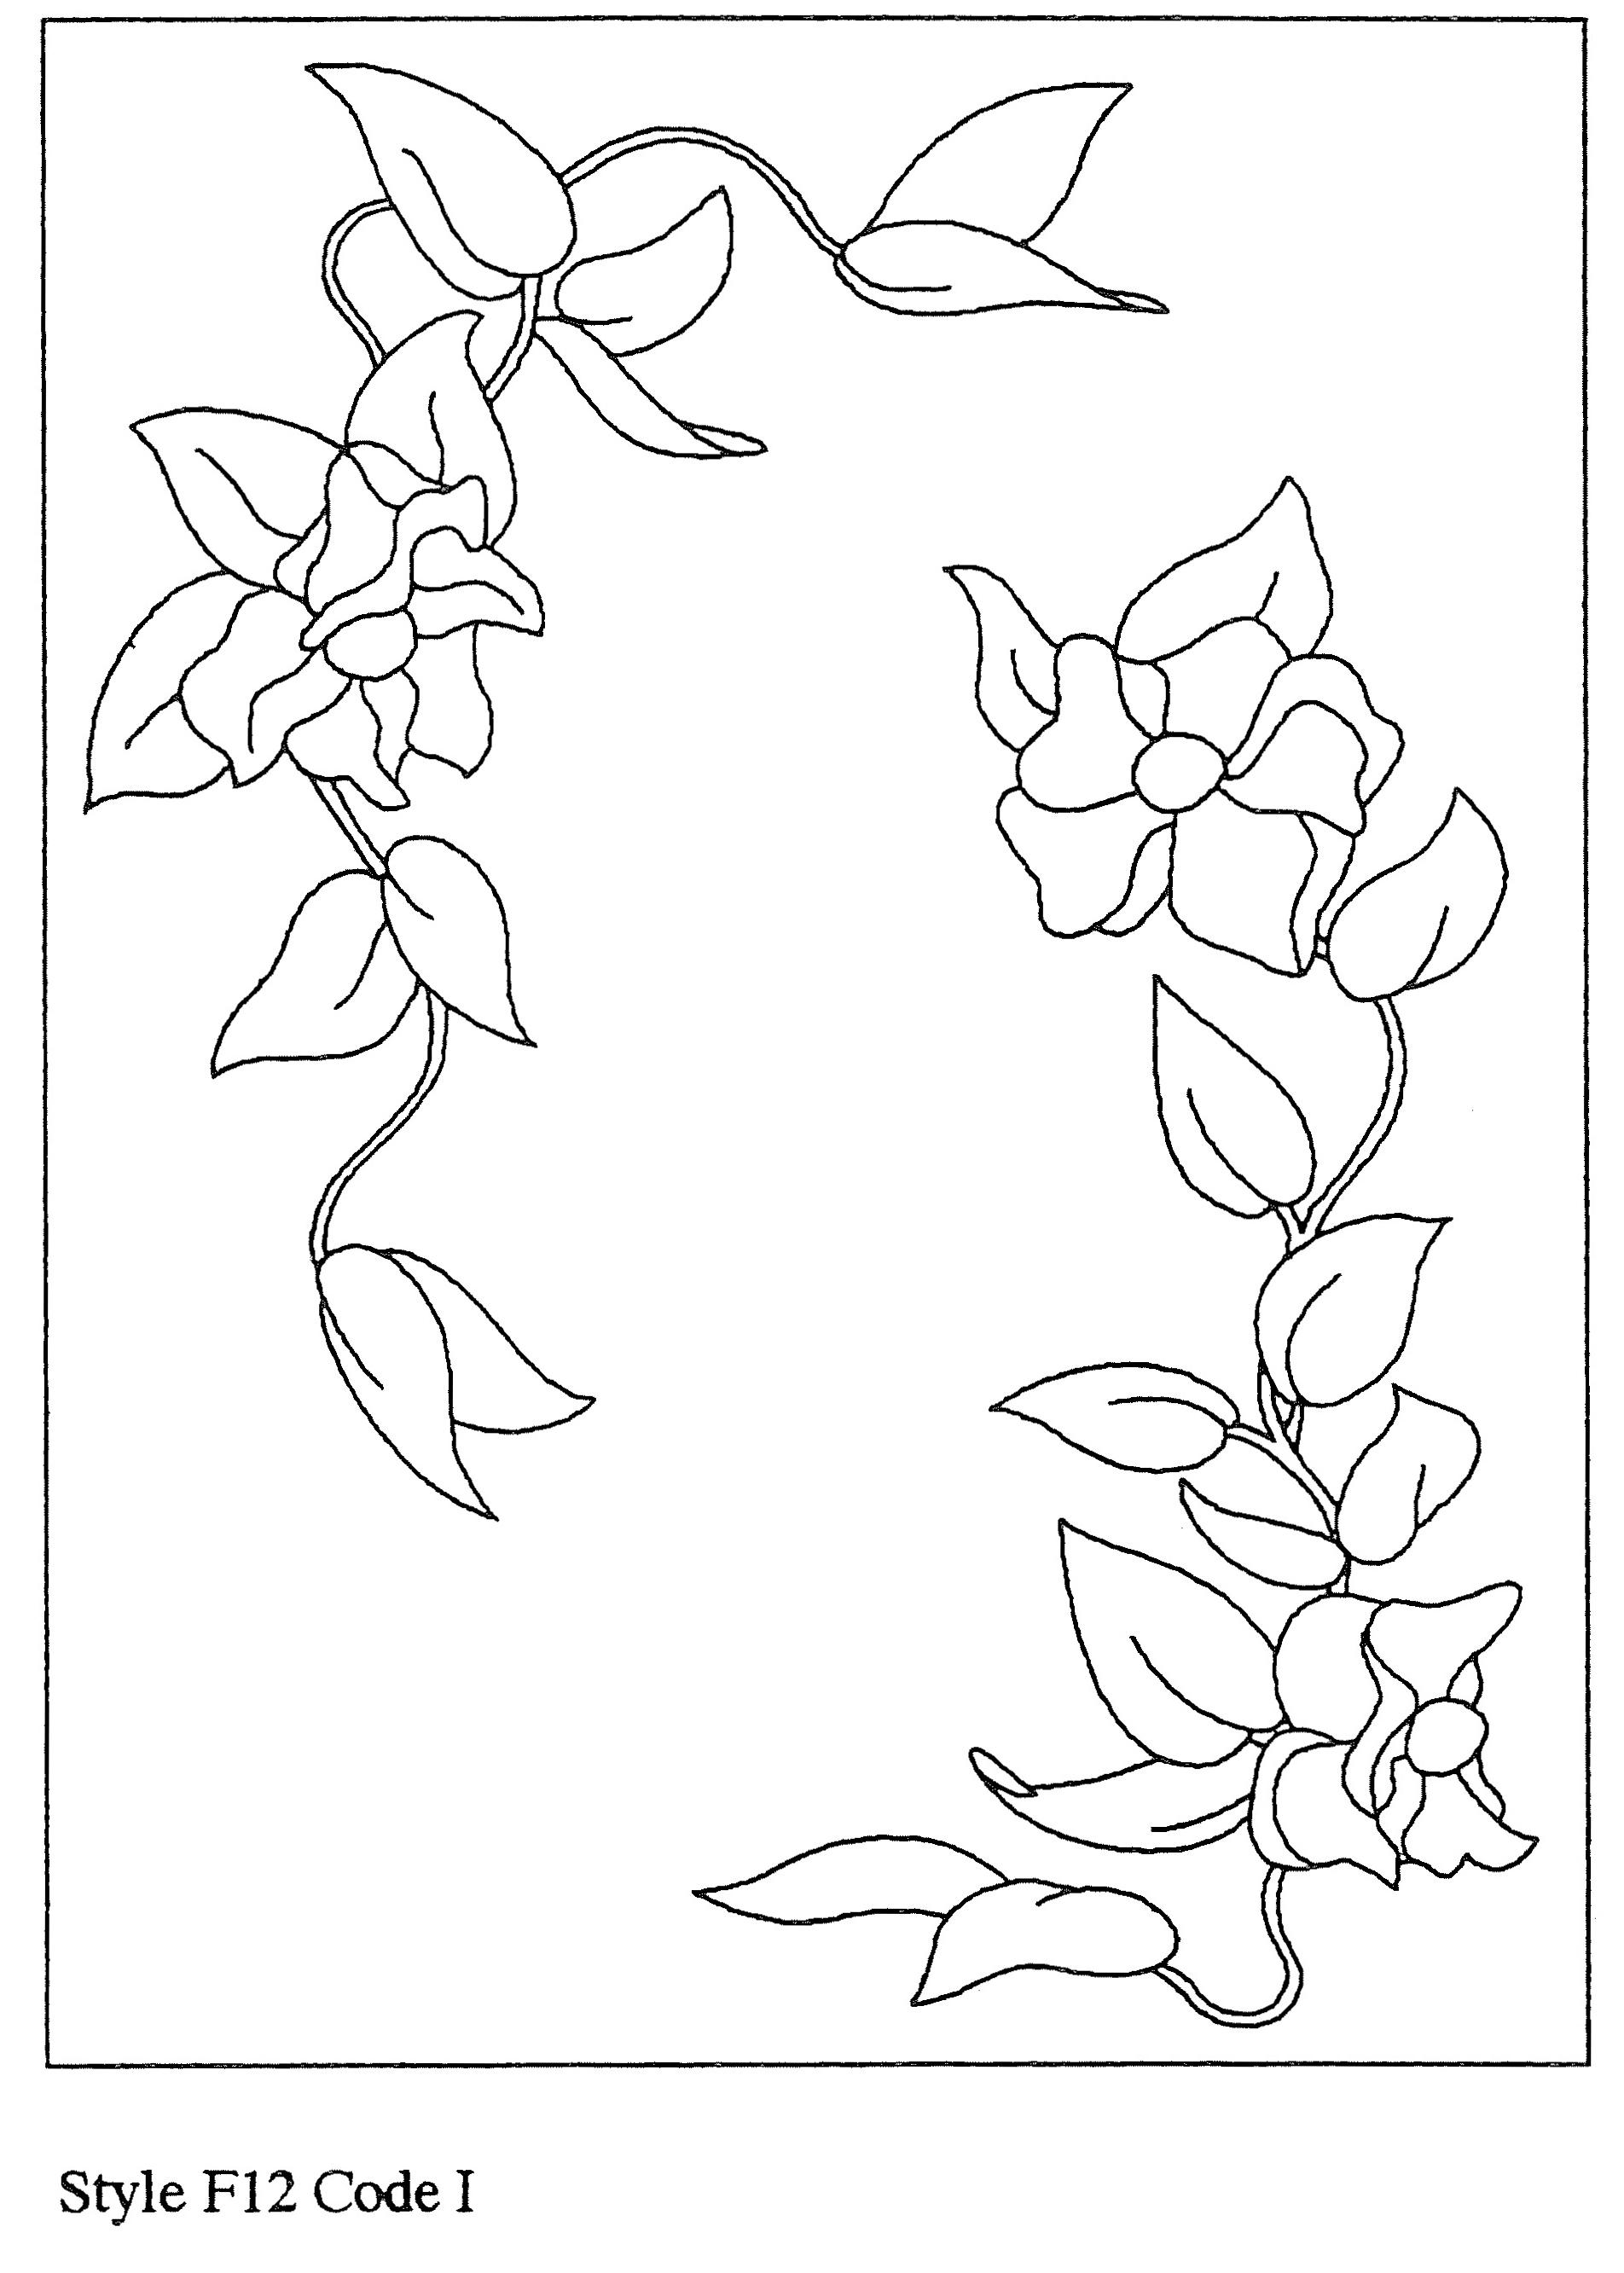 Page 14 copy 3.jpg